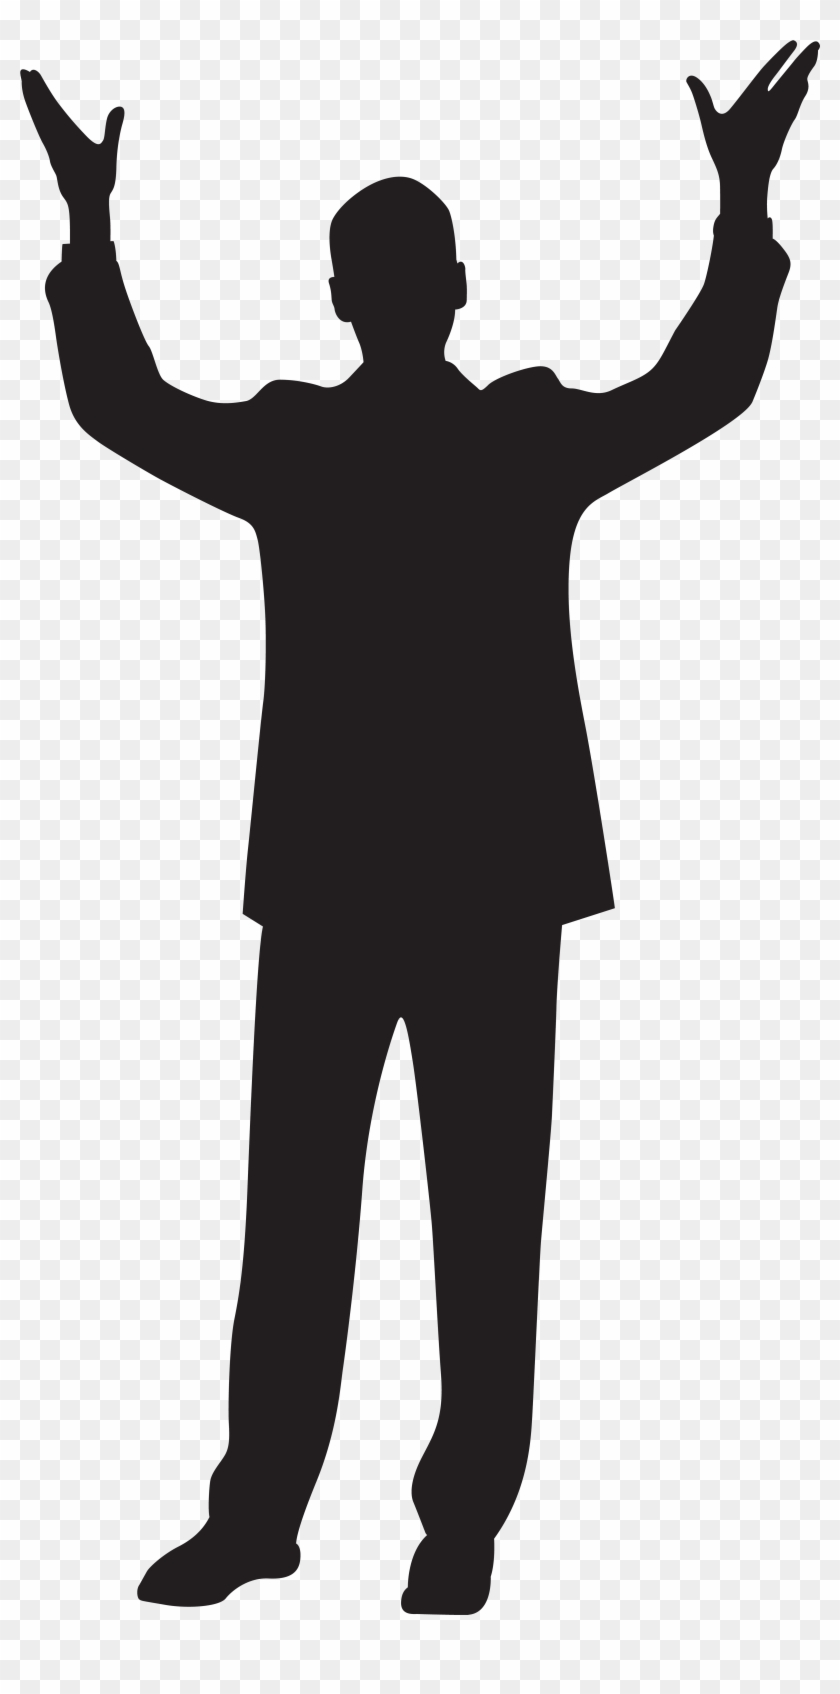 Man With Hands Up Silhouette Clip Art Imageu200b Gallery - Men Dance Vector #48208